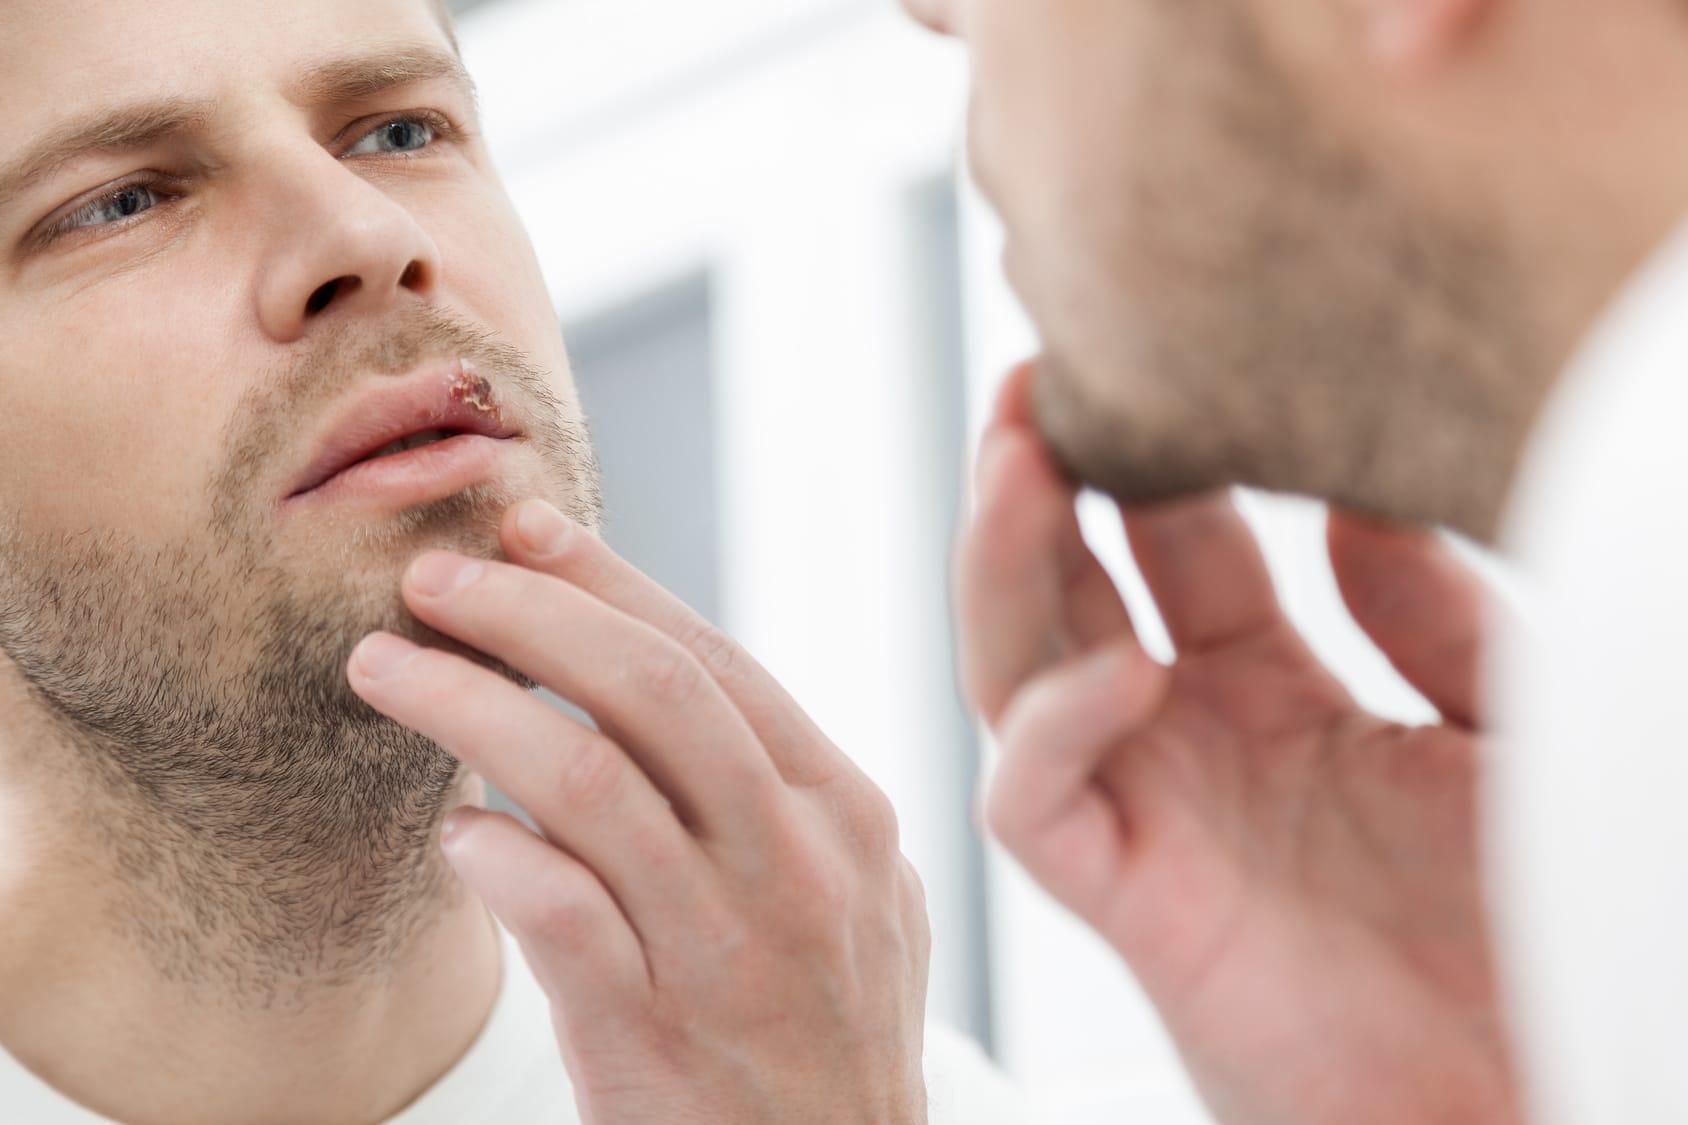 Hausmittel gegen Herpes – 4 Tipps & Tricks